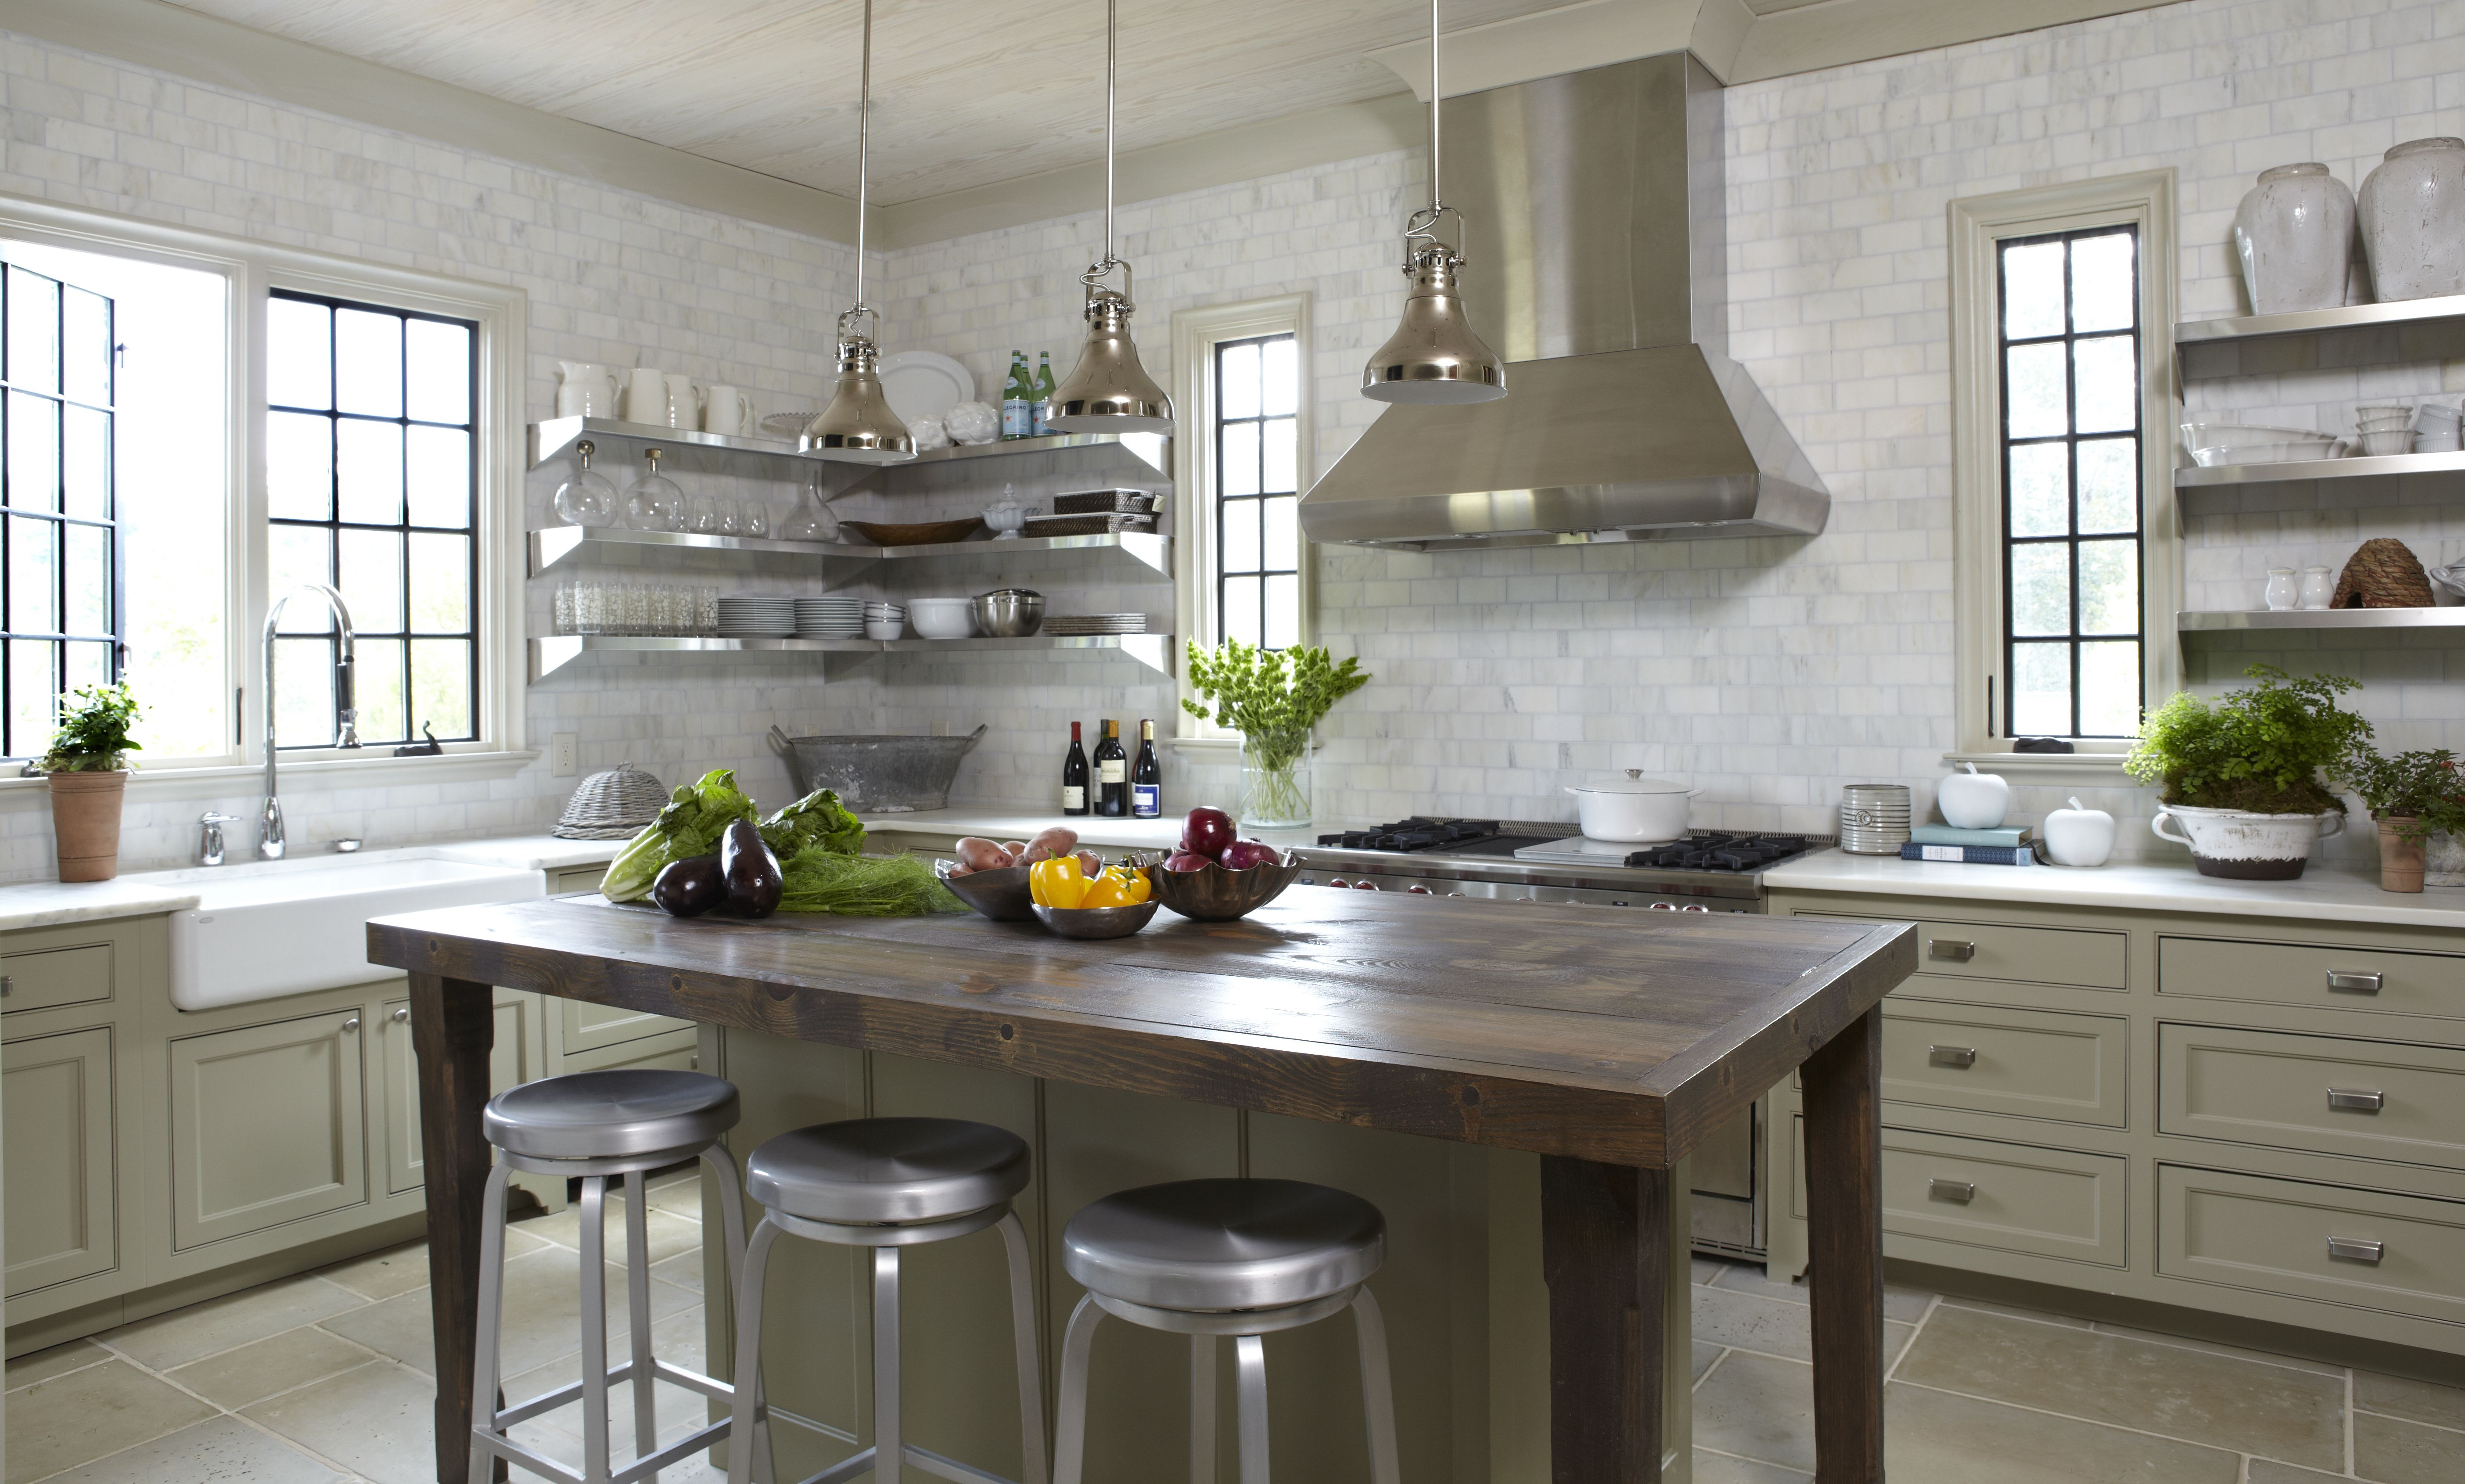 Cabinet color - Benjamin Moore Nantucket Grey, black window trim